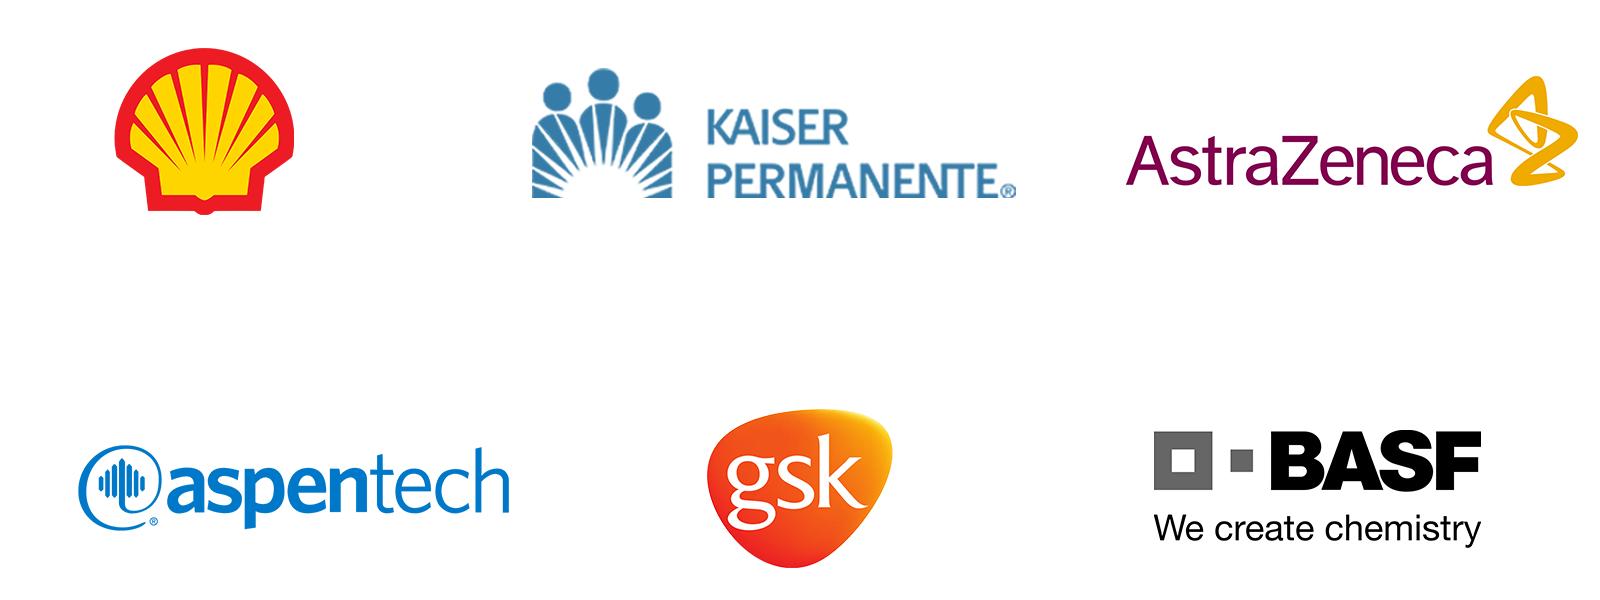 Logos of Shell, Kaiser Permante, AstraZeneca, Aspen Technology, GlaxoSmithKline, and BASF